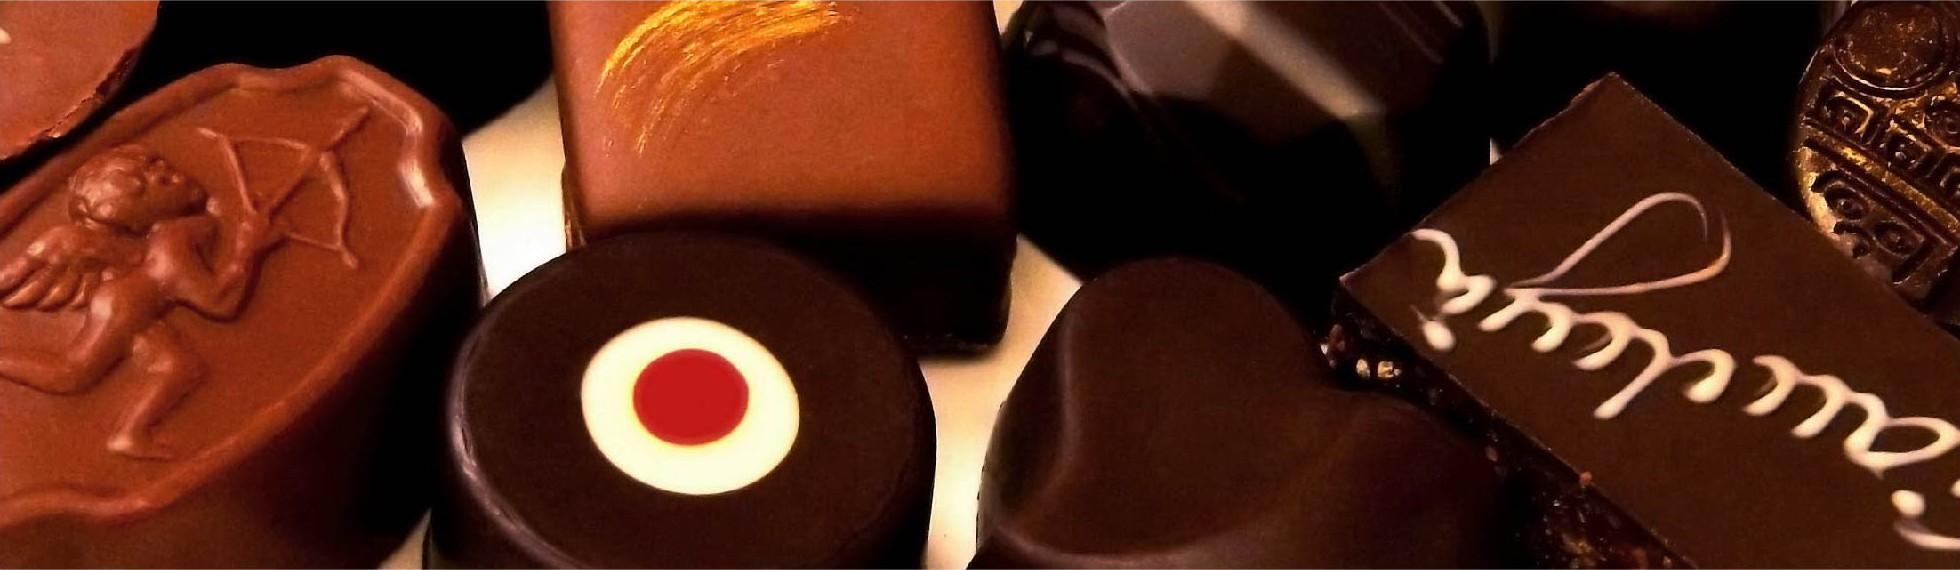 Adore Chocolaterie